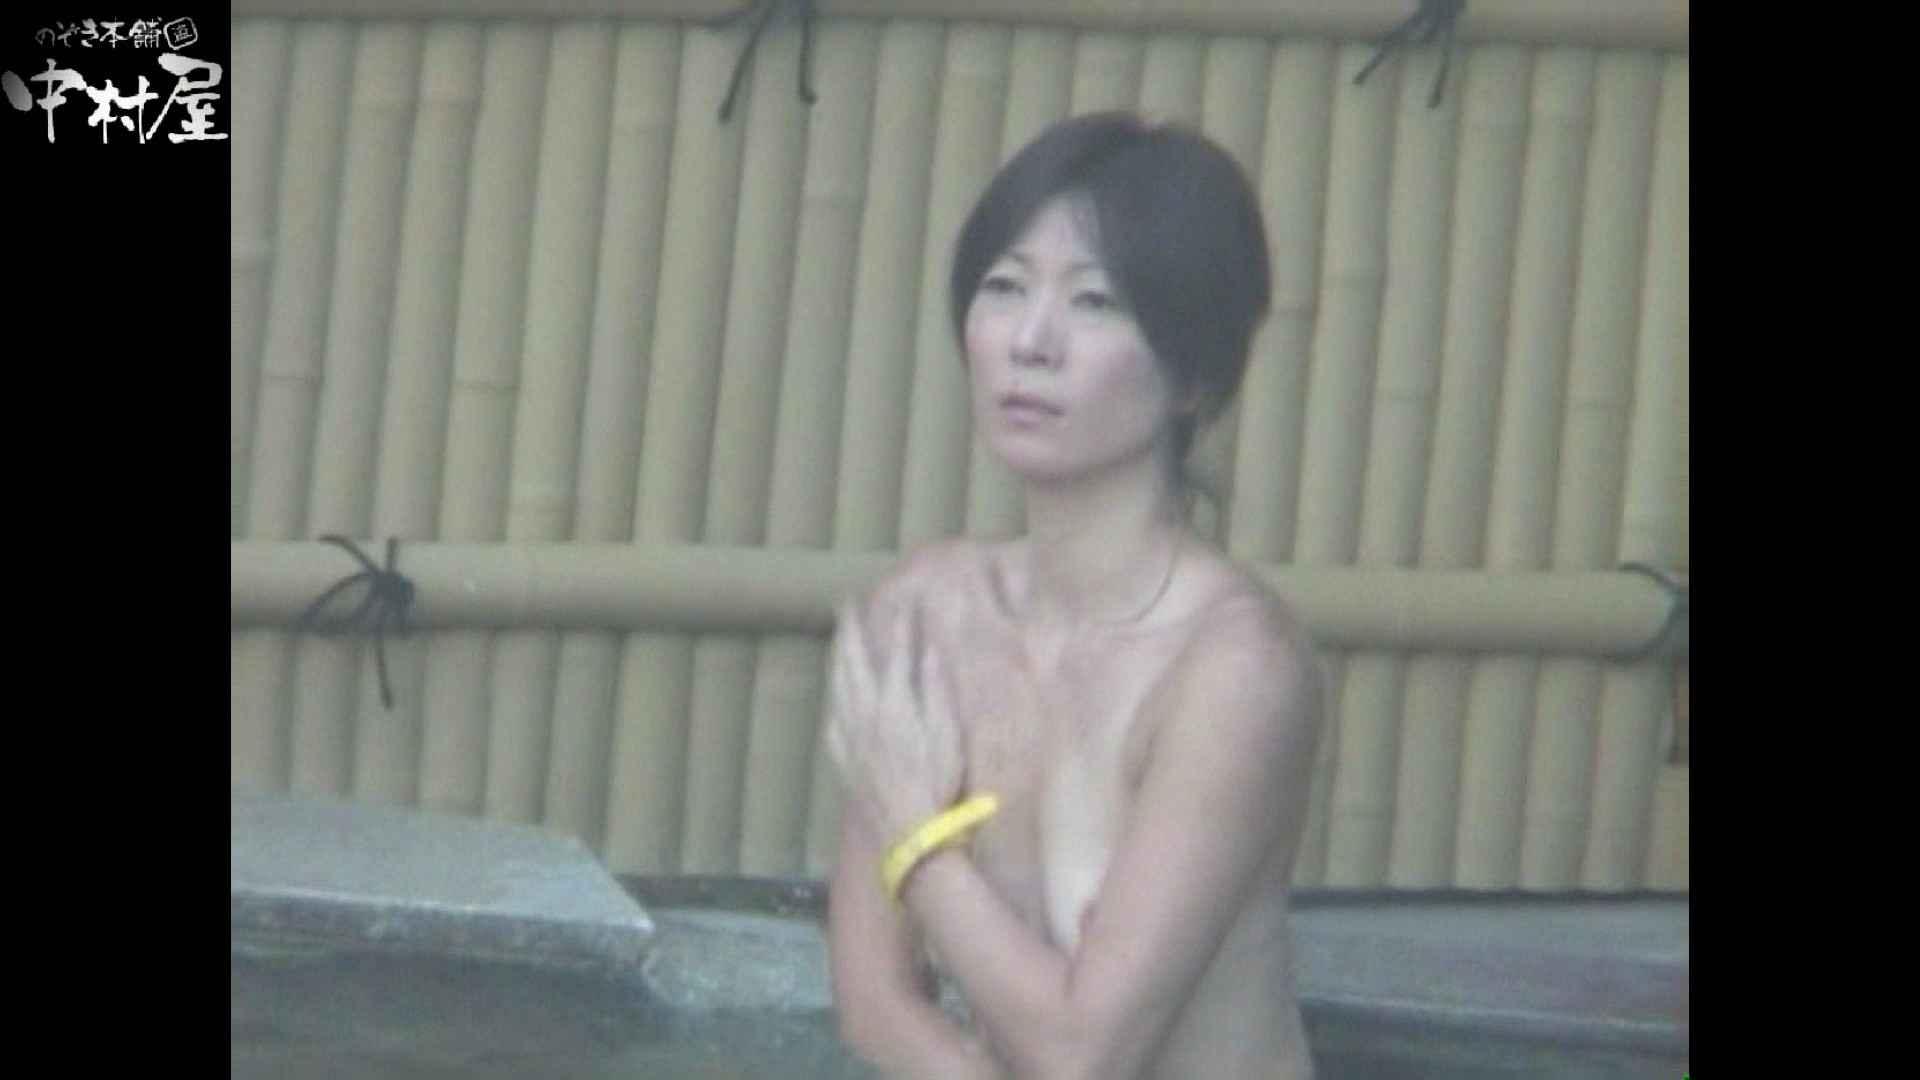 Aquaな露天風呂Vol.972 0  77連発 76